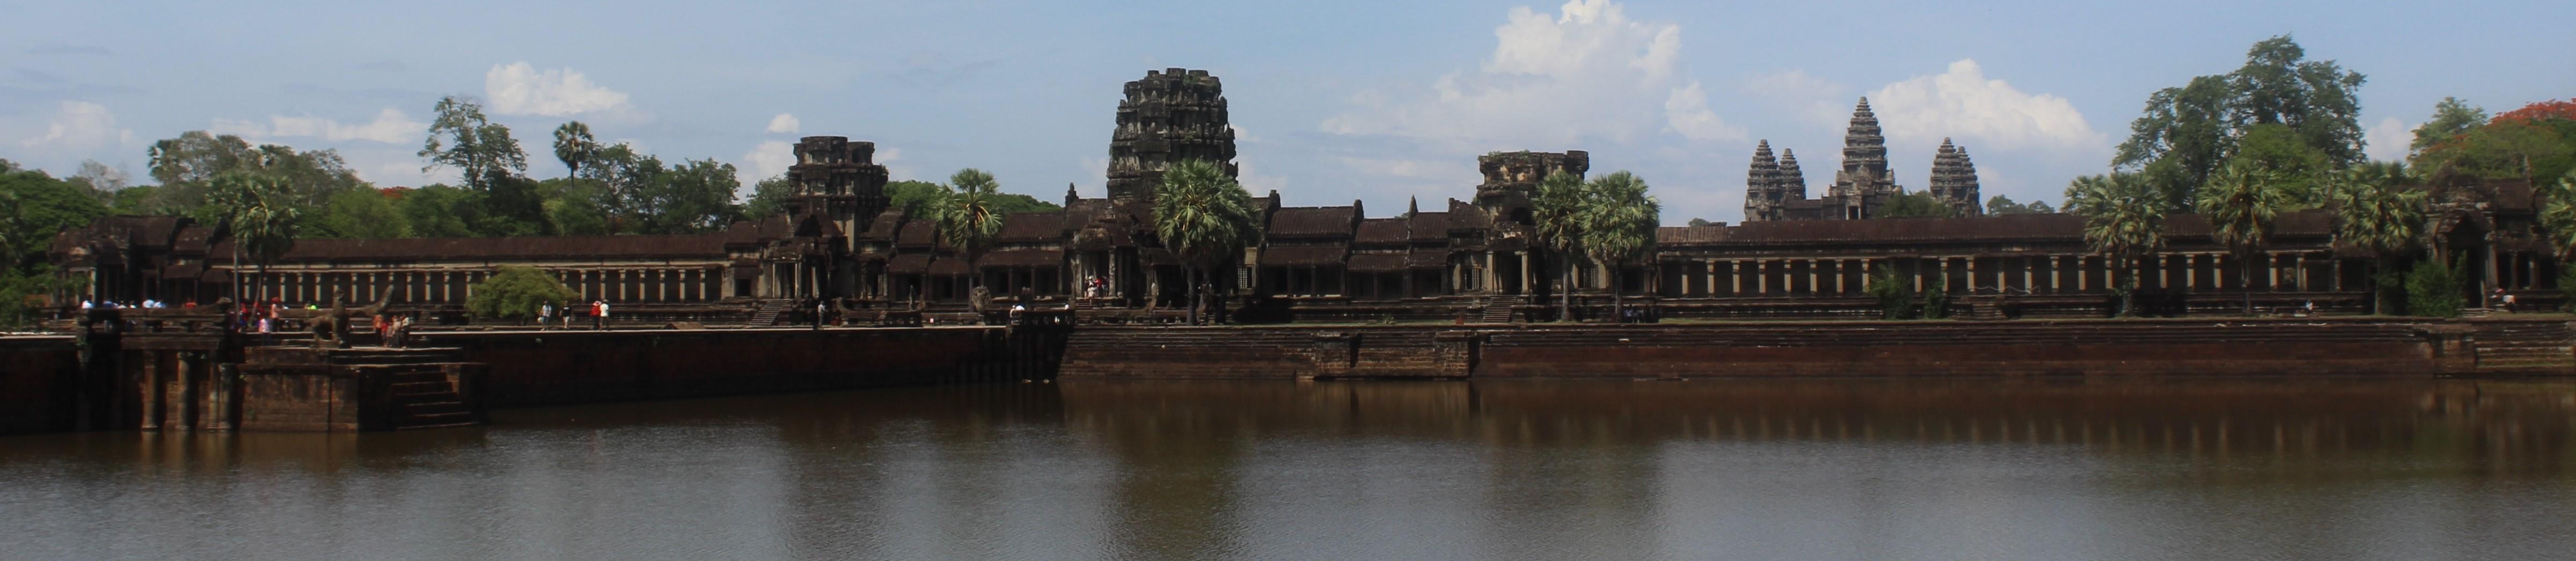 AngkorWat_360